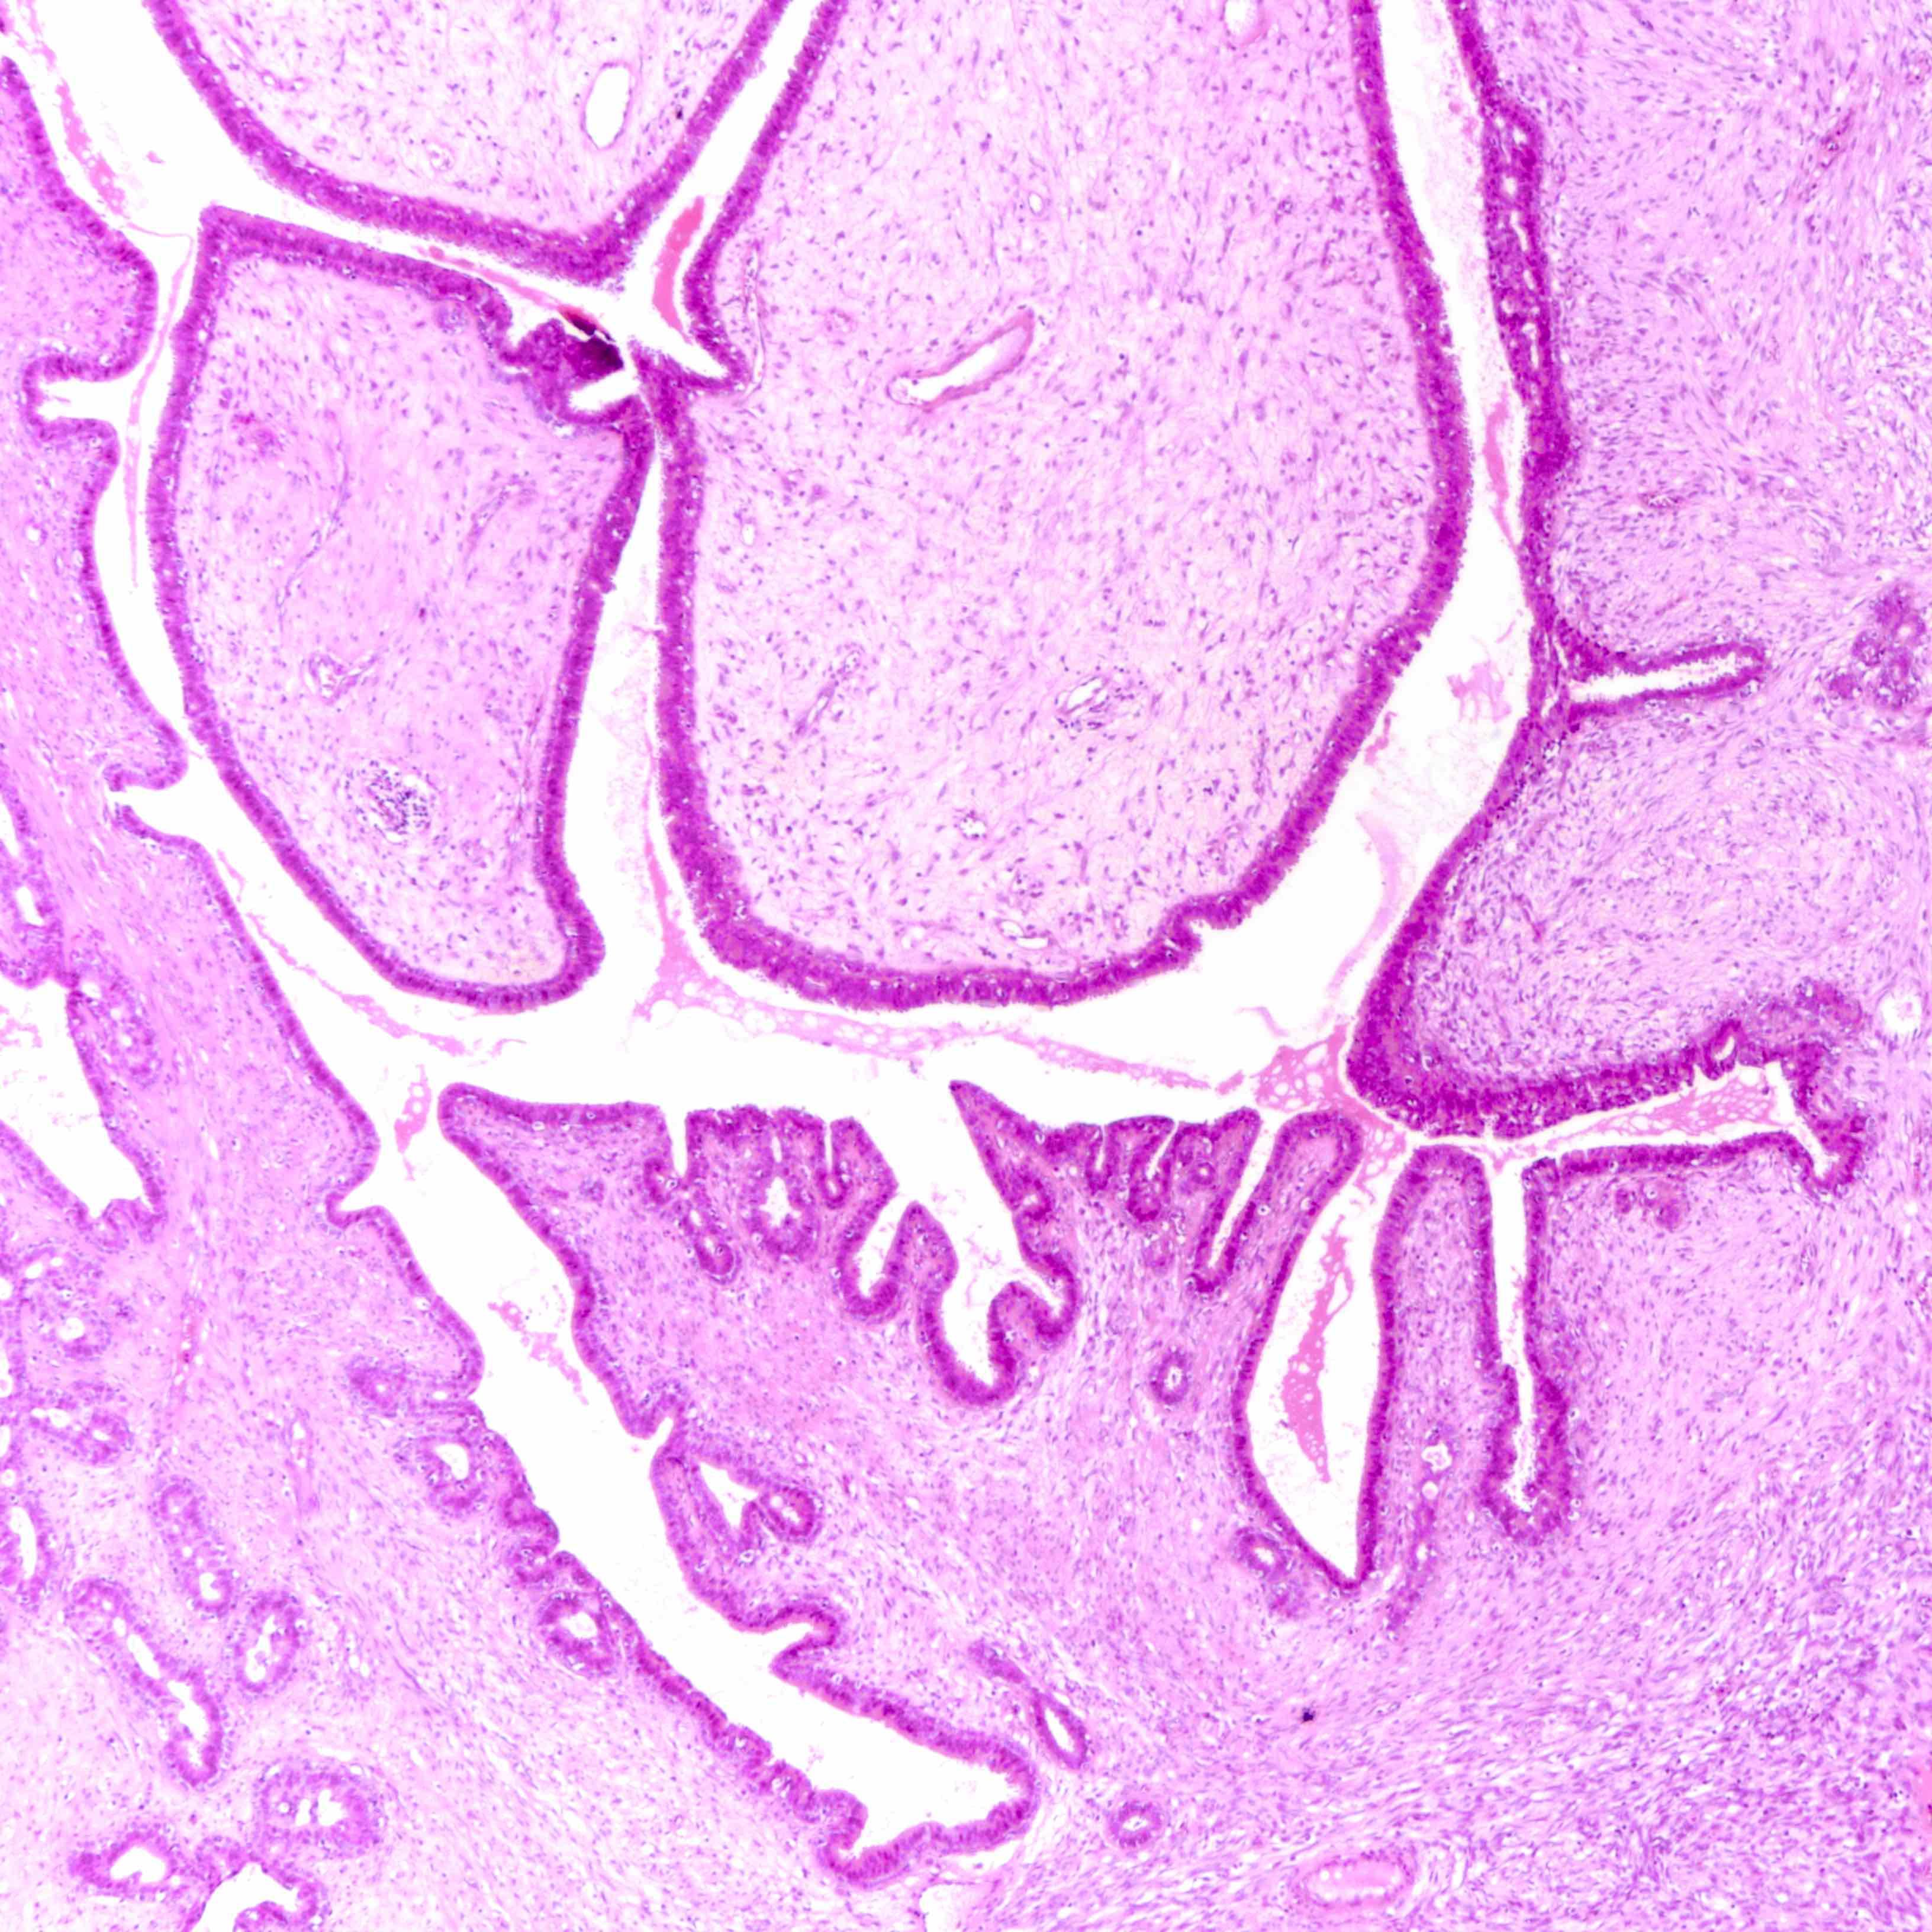 Leaf-like epithelial pattern